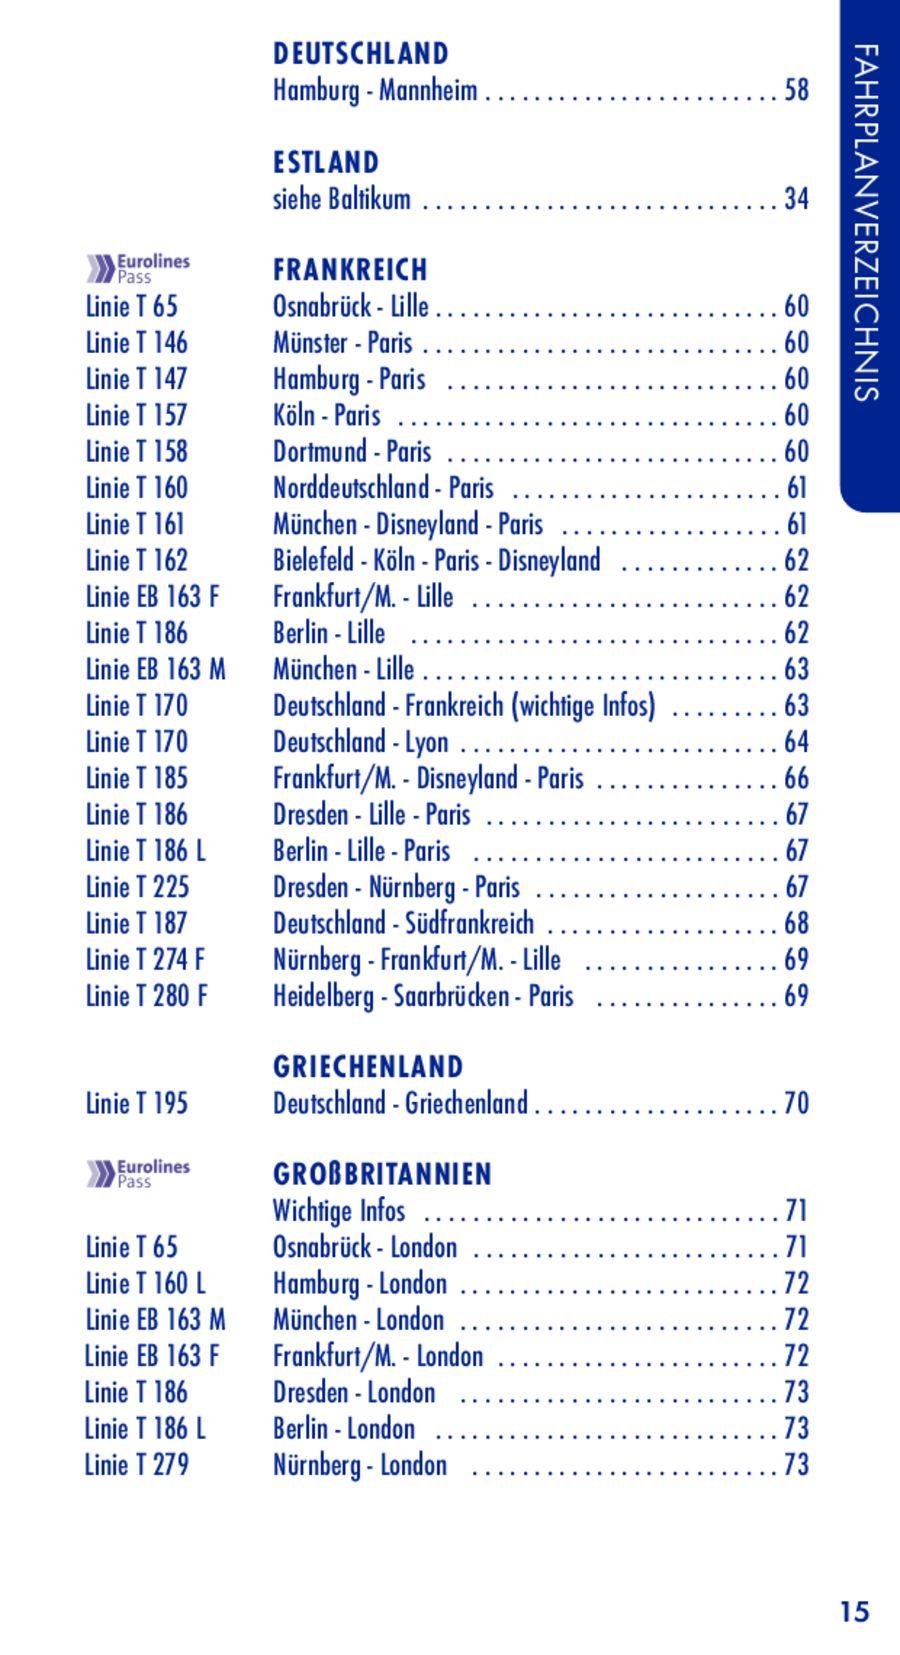 touring eurolines stuttgart